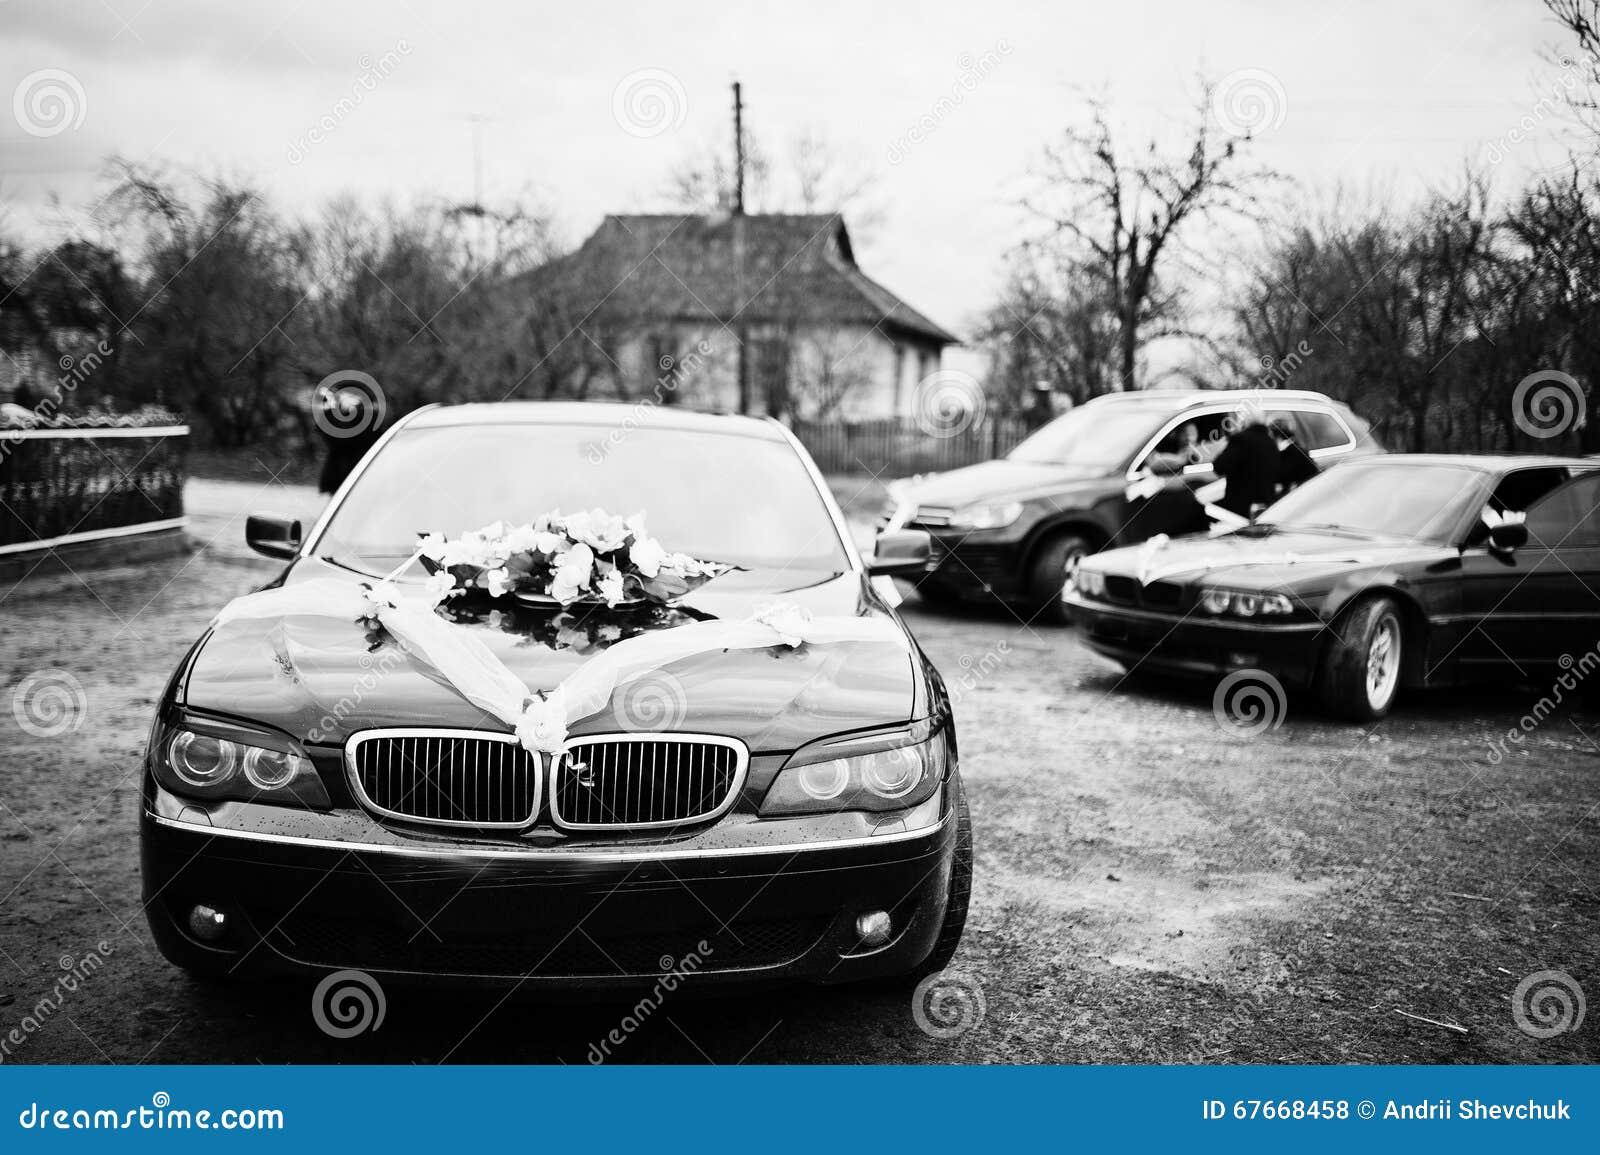 Luxury Wedding Cars With Decor Stock Photo Image Of Love Luxury